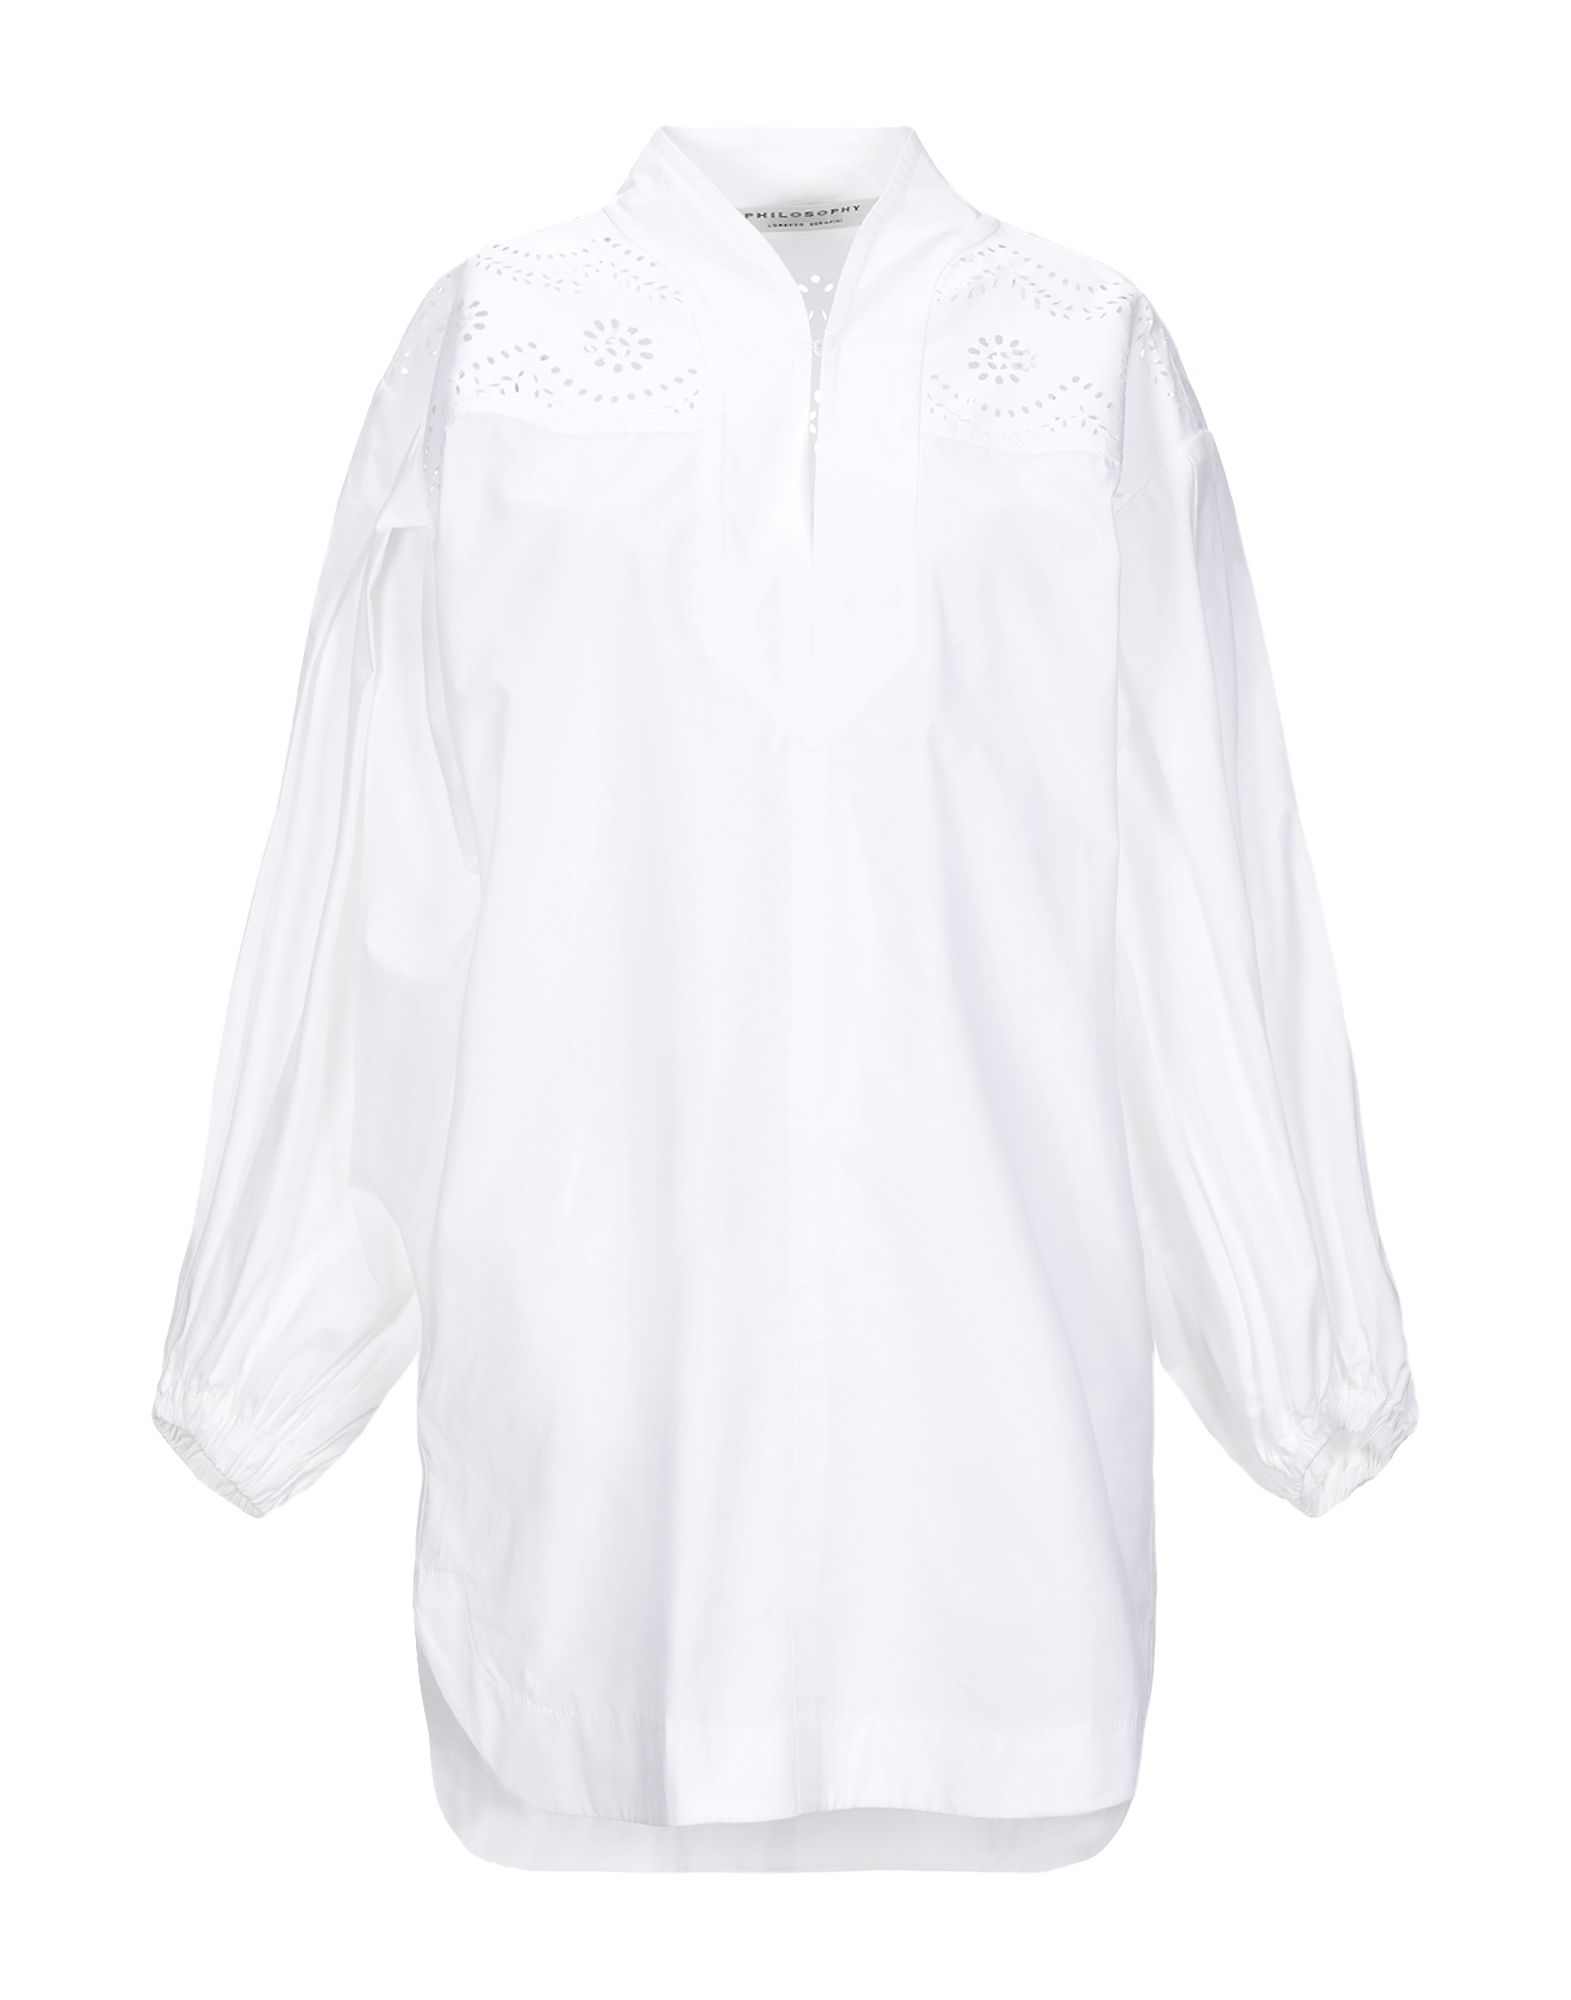 PHILOSOPHY di LORENZO SERAFINI Short dresses. plain weave, openwork, no appliqués, basic solid color, deep neckline, long sleeves, multipockets, side slit hemline, unlined. 100% Cotton